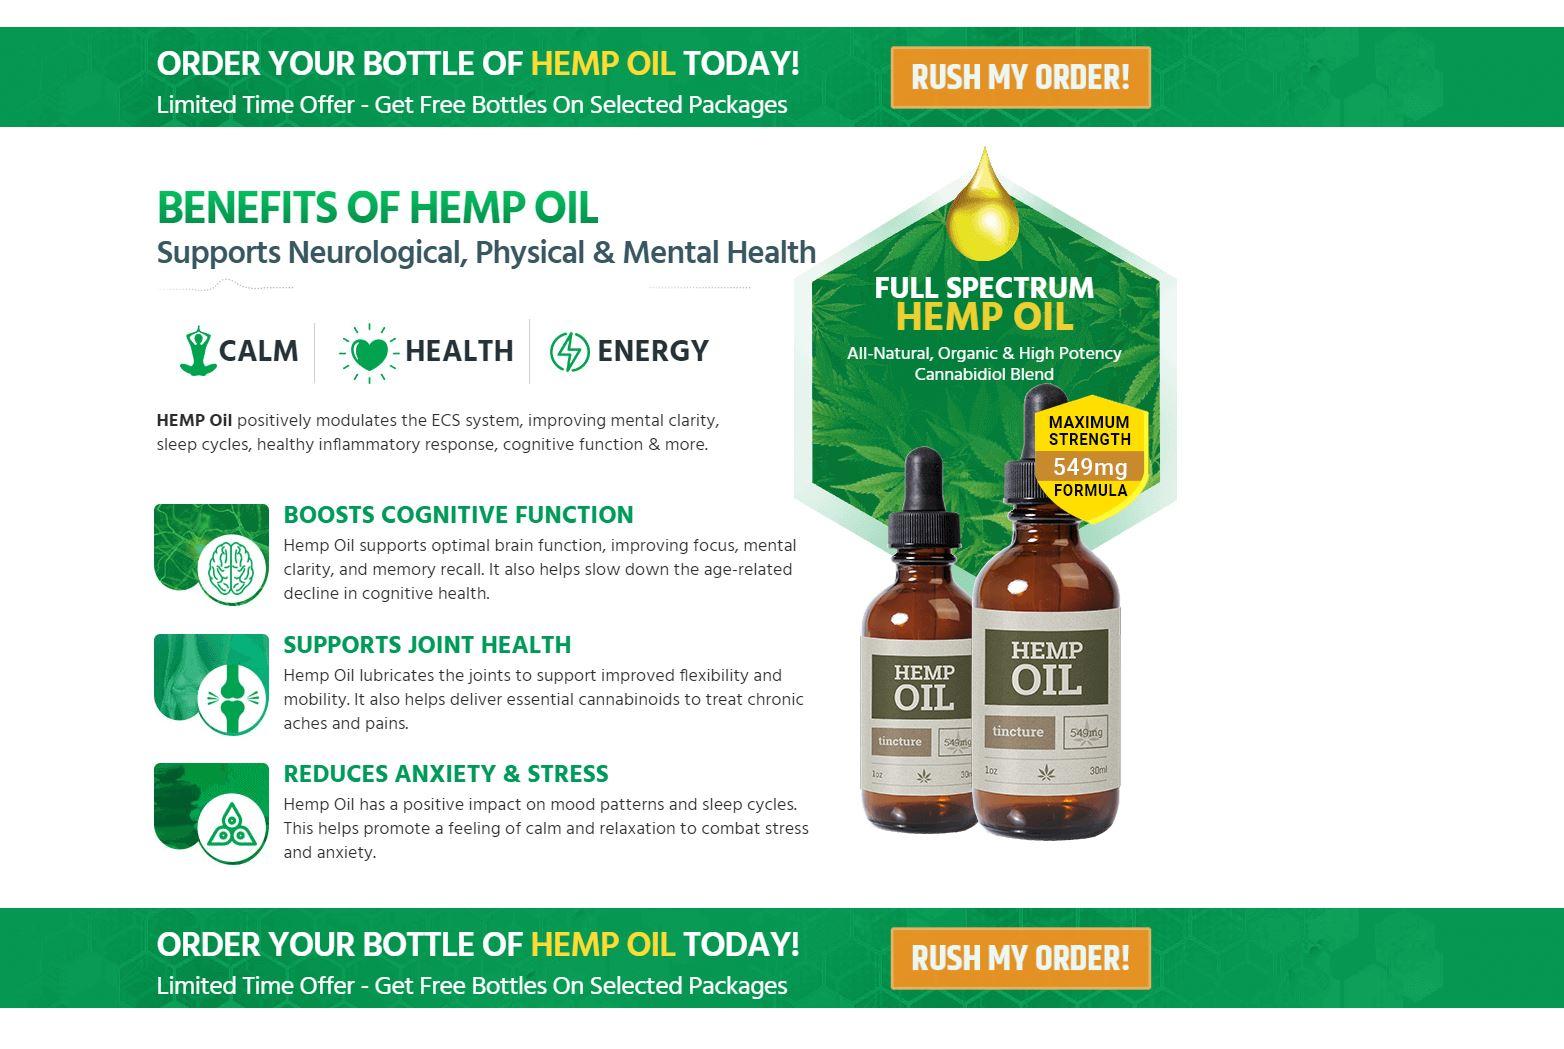 David Suzuki CBD hemp oil